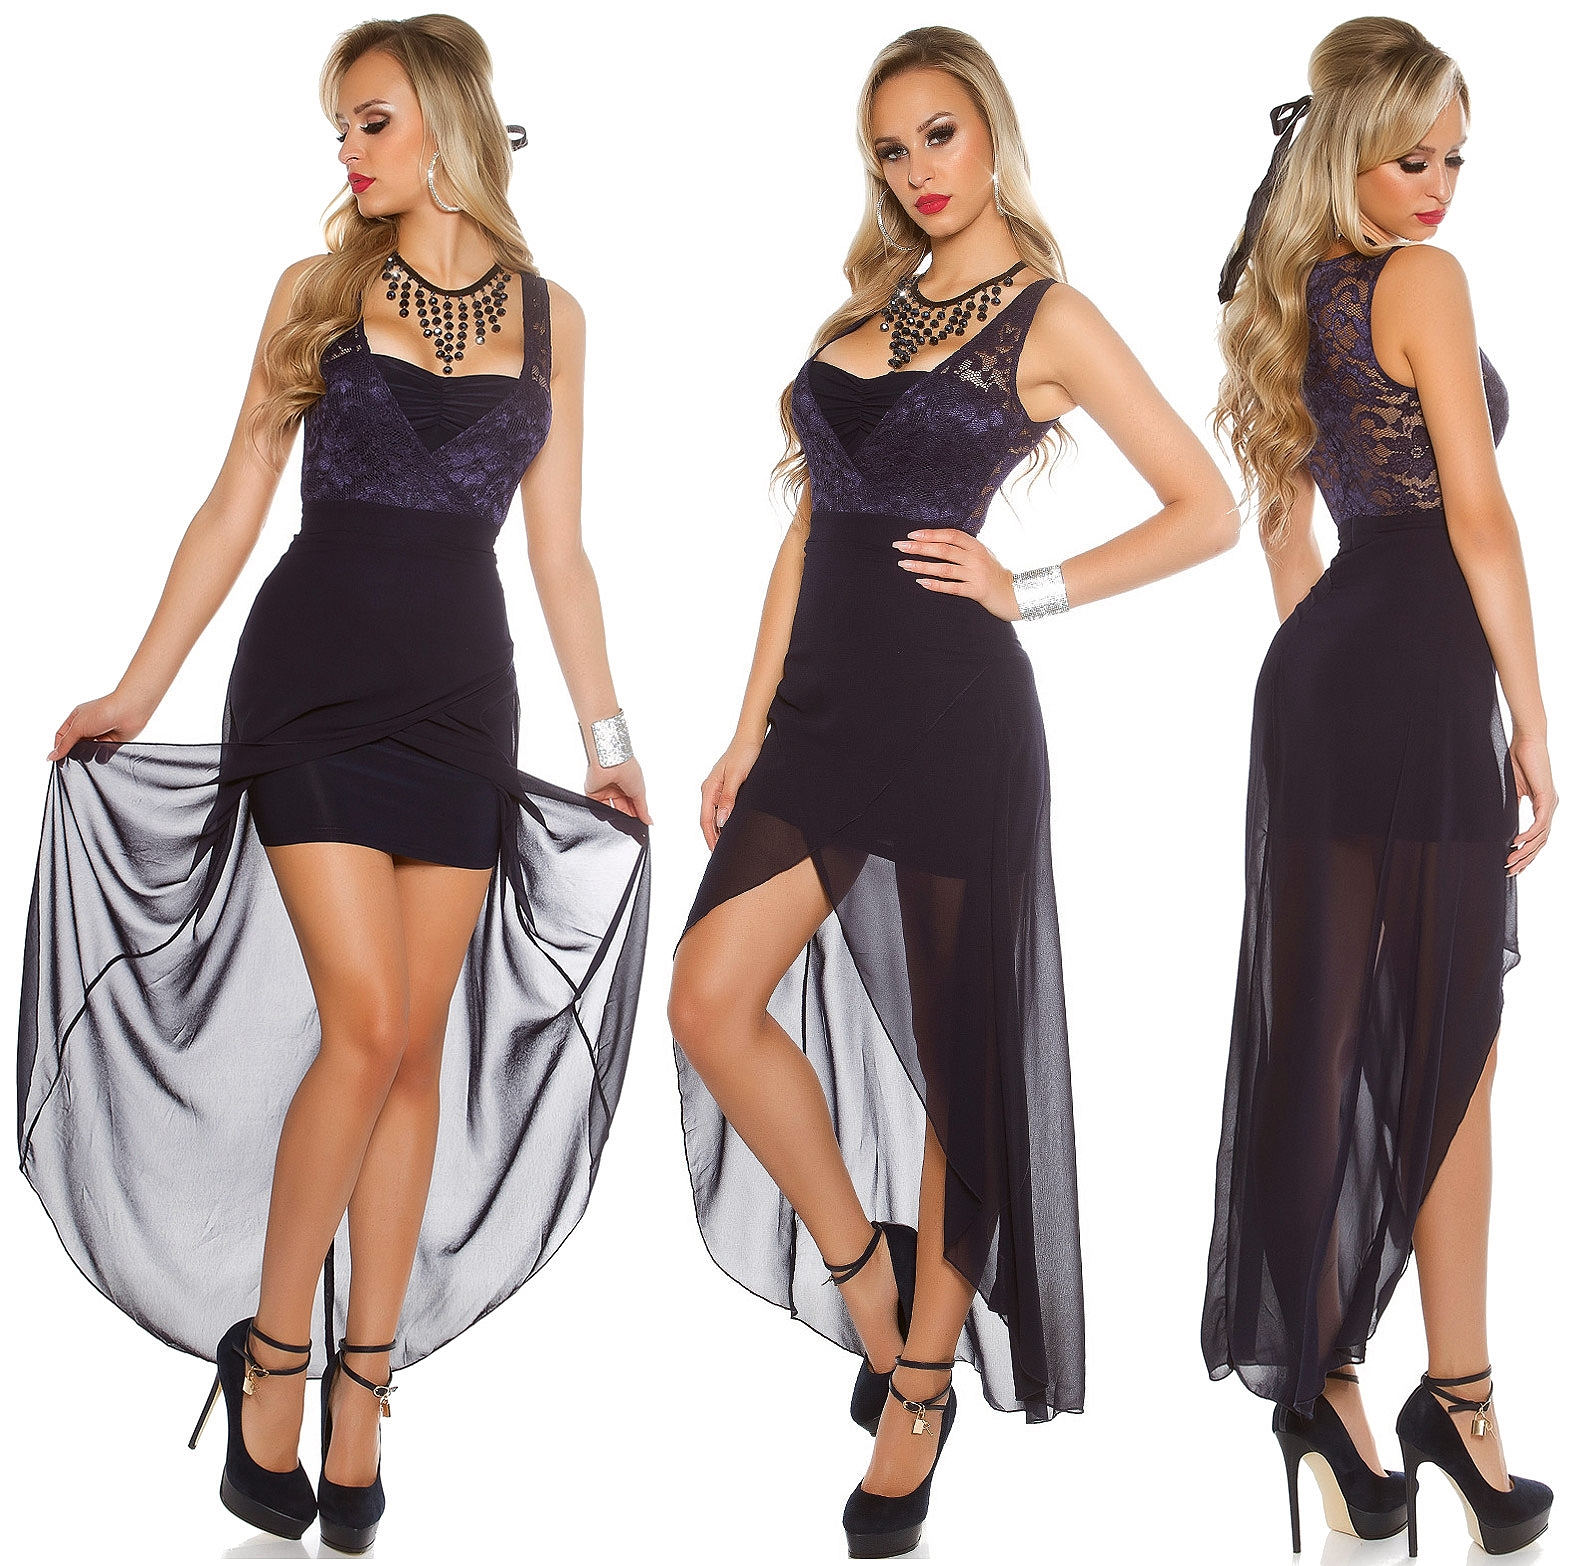 vokuhila kleid spitze chiffon highlow abendkleid minikleid hochzeit koucla dress ebay. Black Bedroom Furniture Sets. Home Design Ideas